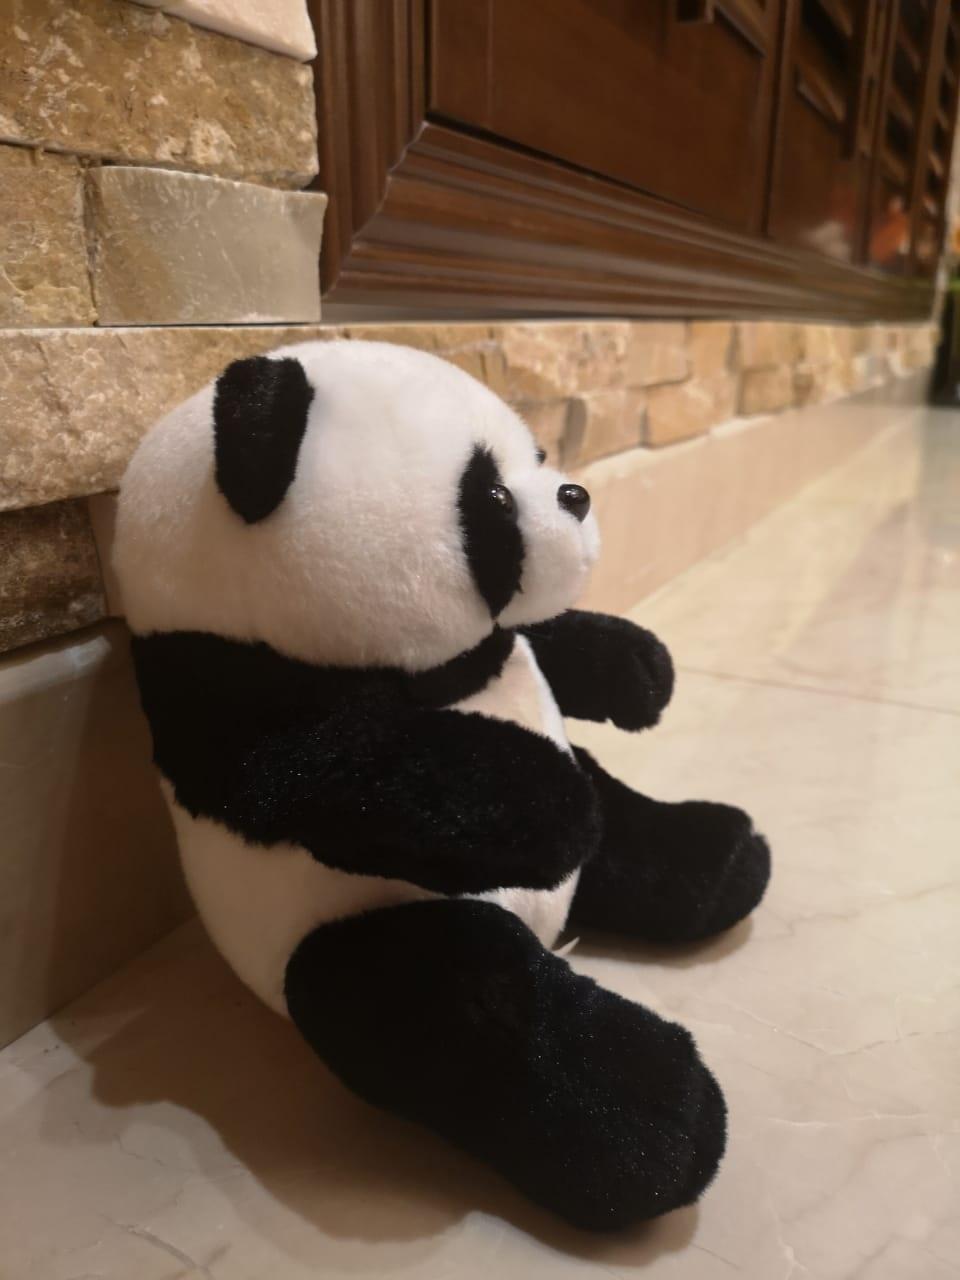 Anxiety Stuffed Animal, Baby Panda Bear Dabdoobee Gifts Trading